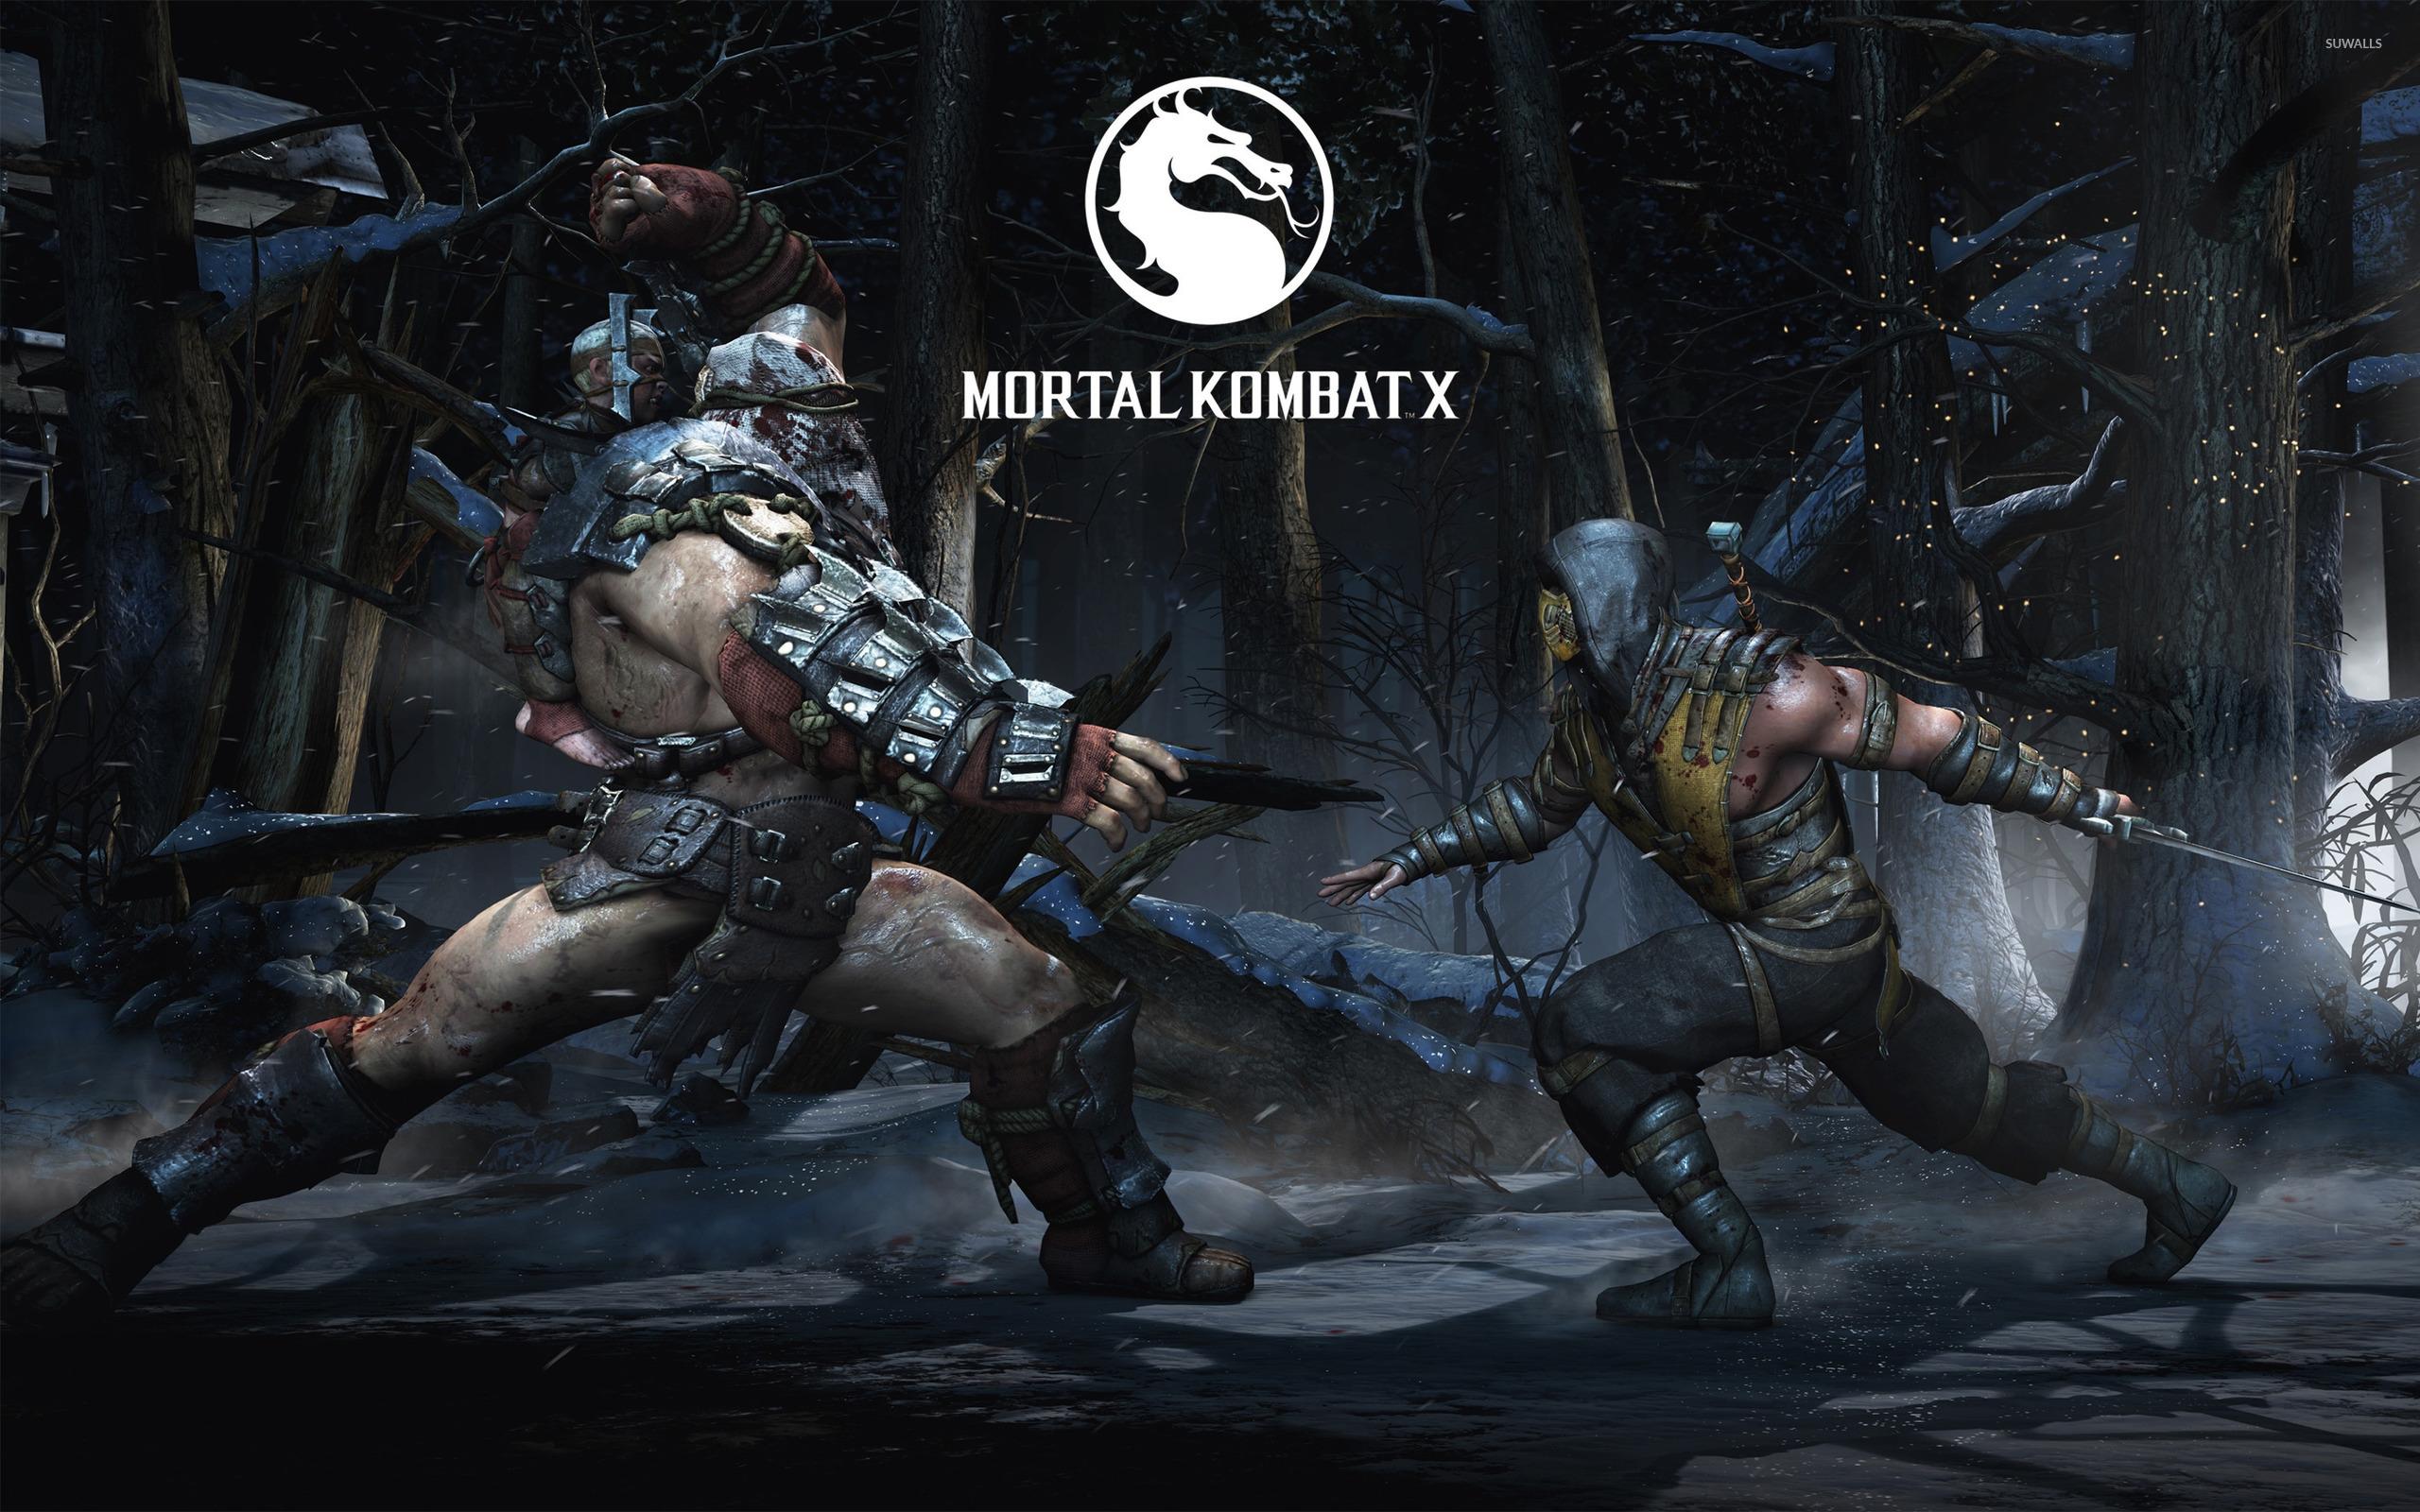 Mortal Kombat X Wallpapers: Mortal Kombat X [4] Wallpaper